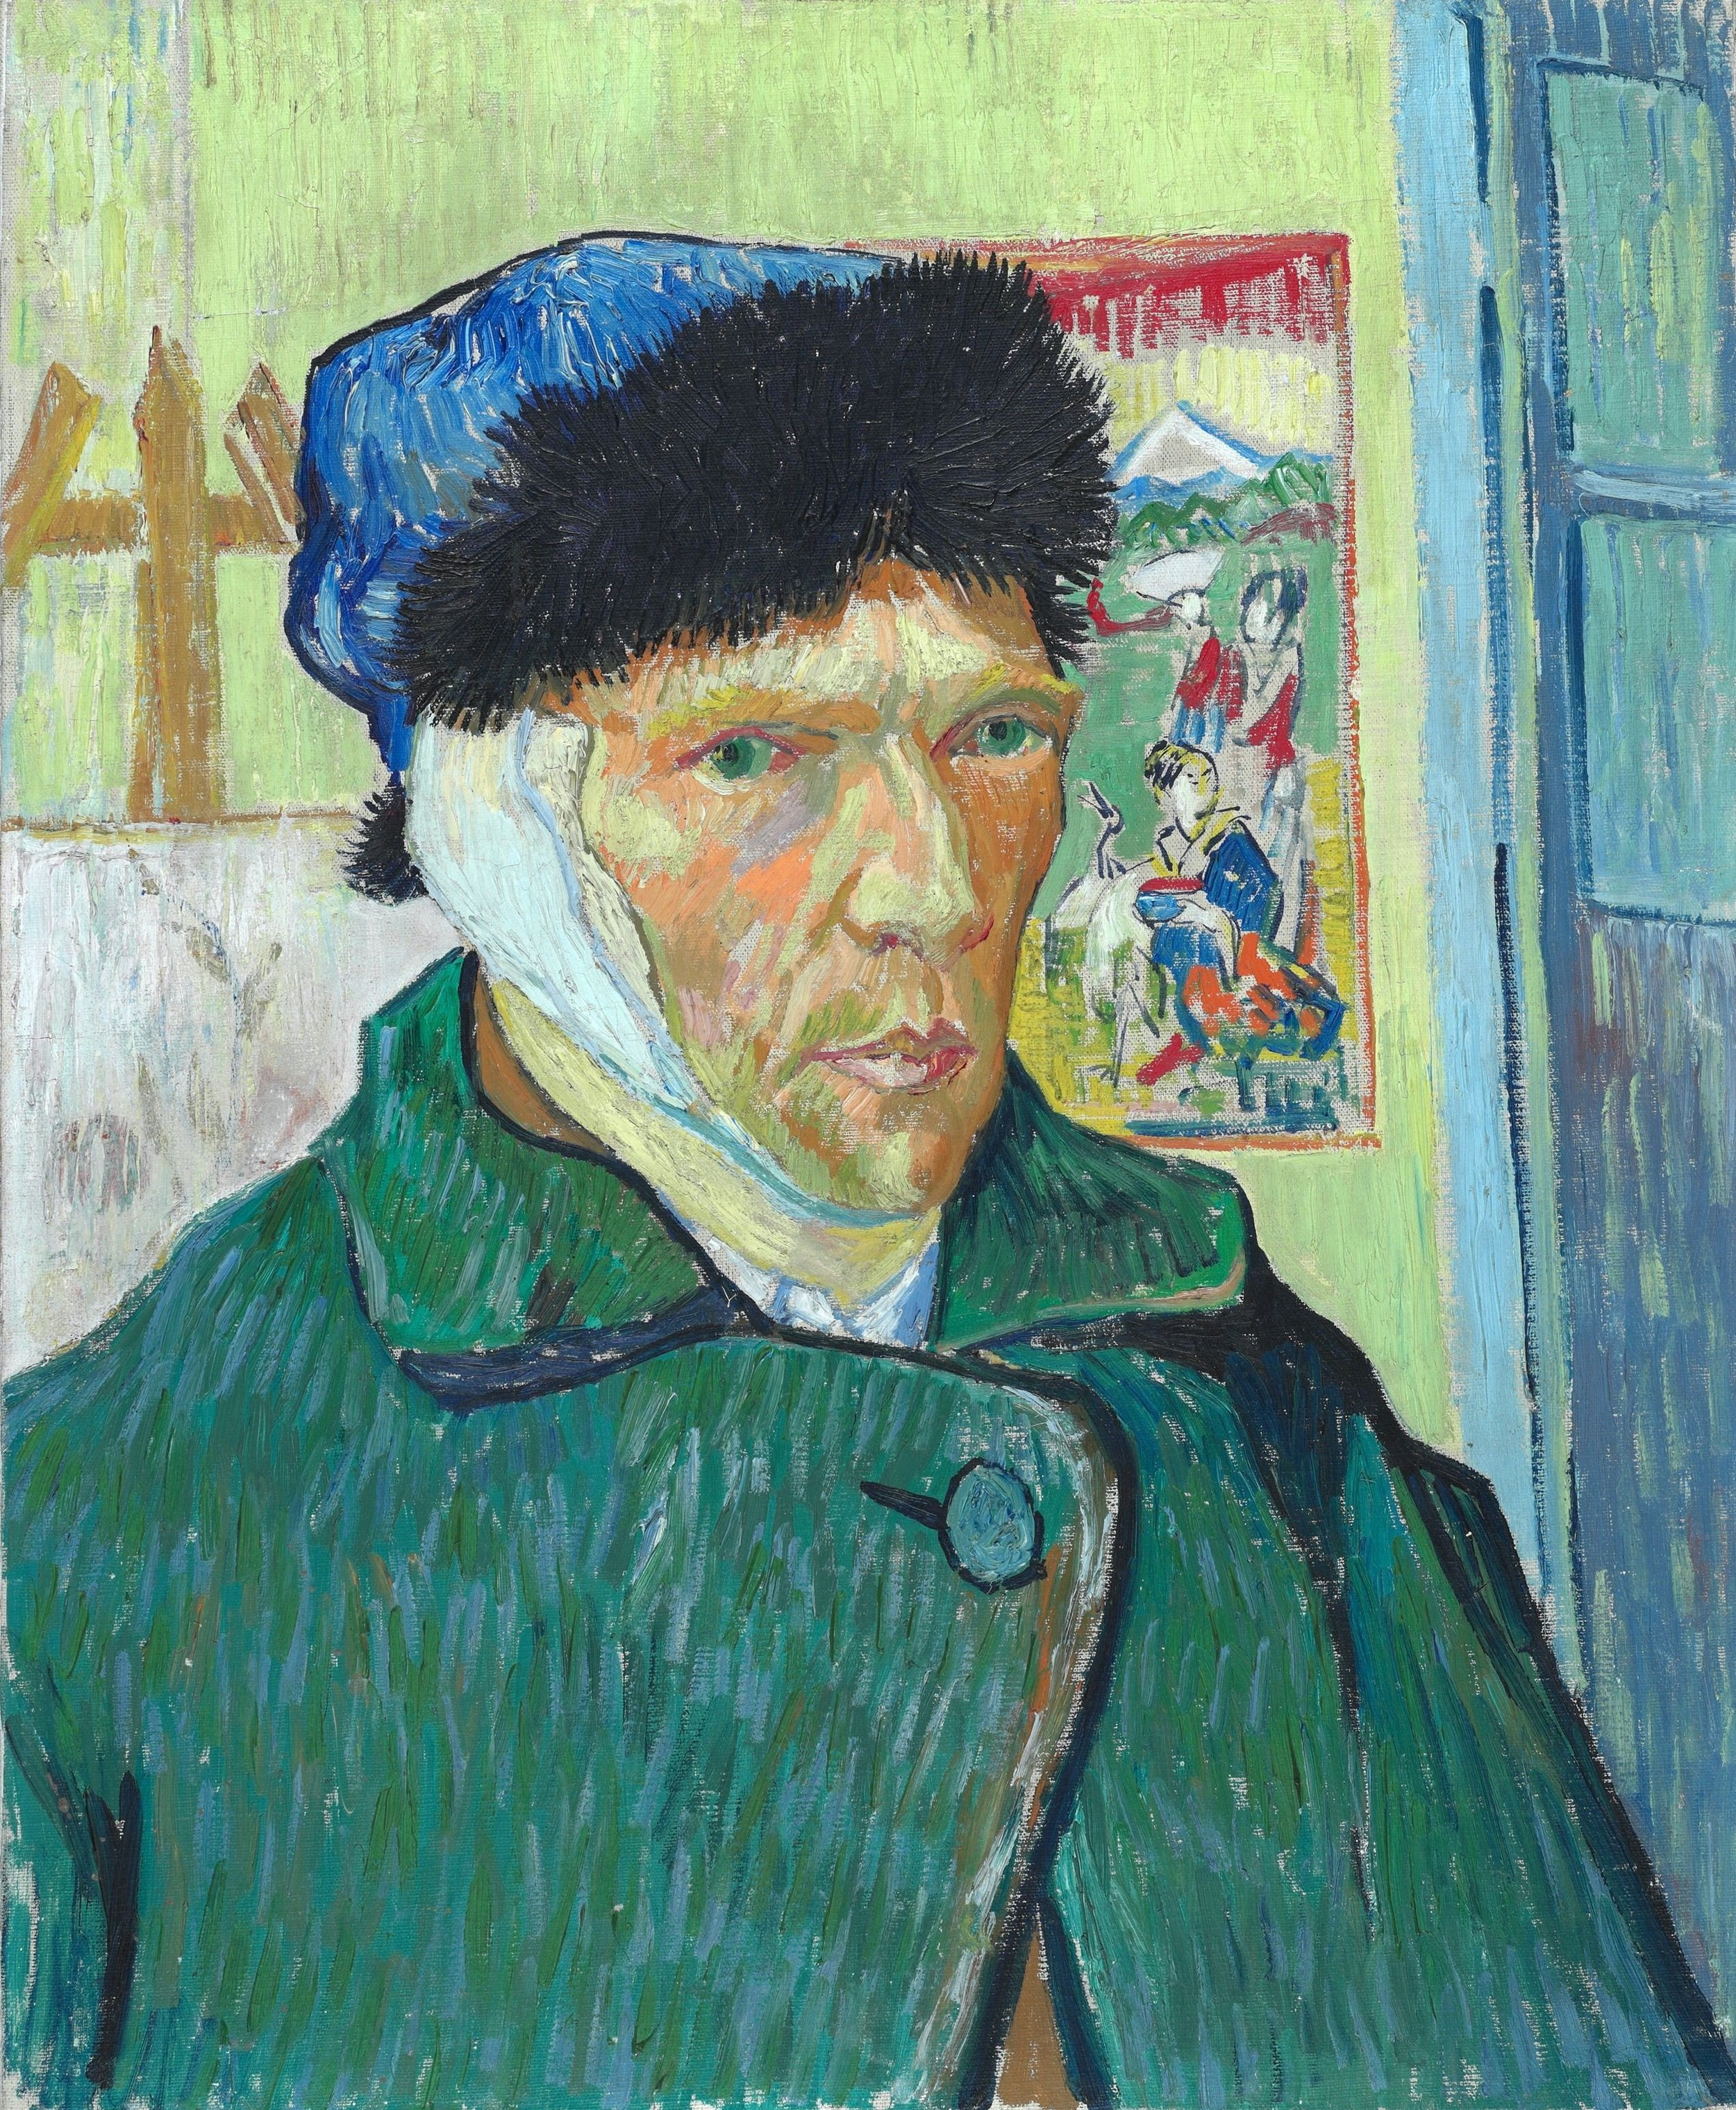 Vincent Van Gogh, 'Self-portrait with Bandaged Ear,' 1889